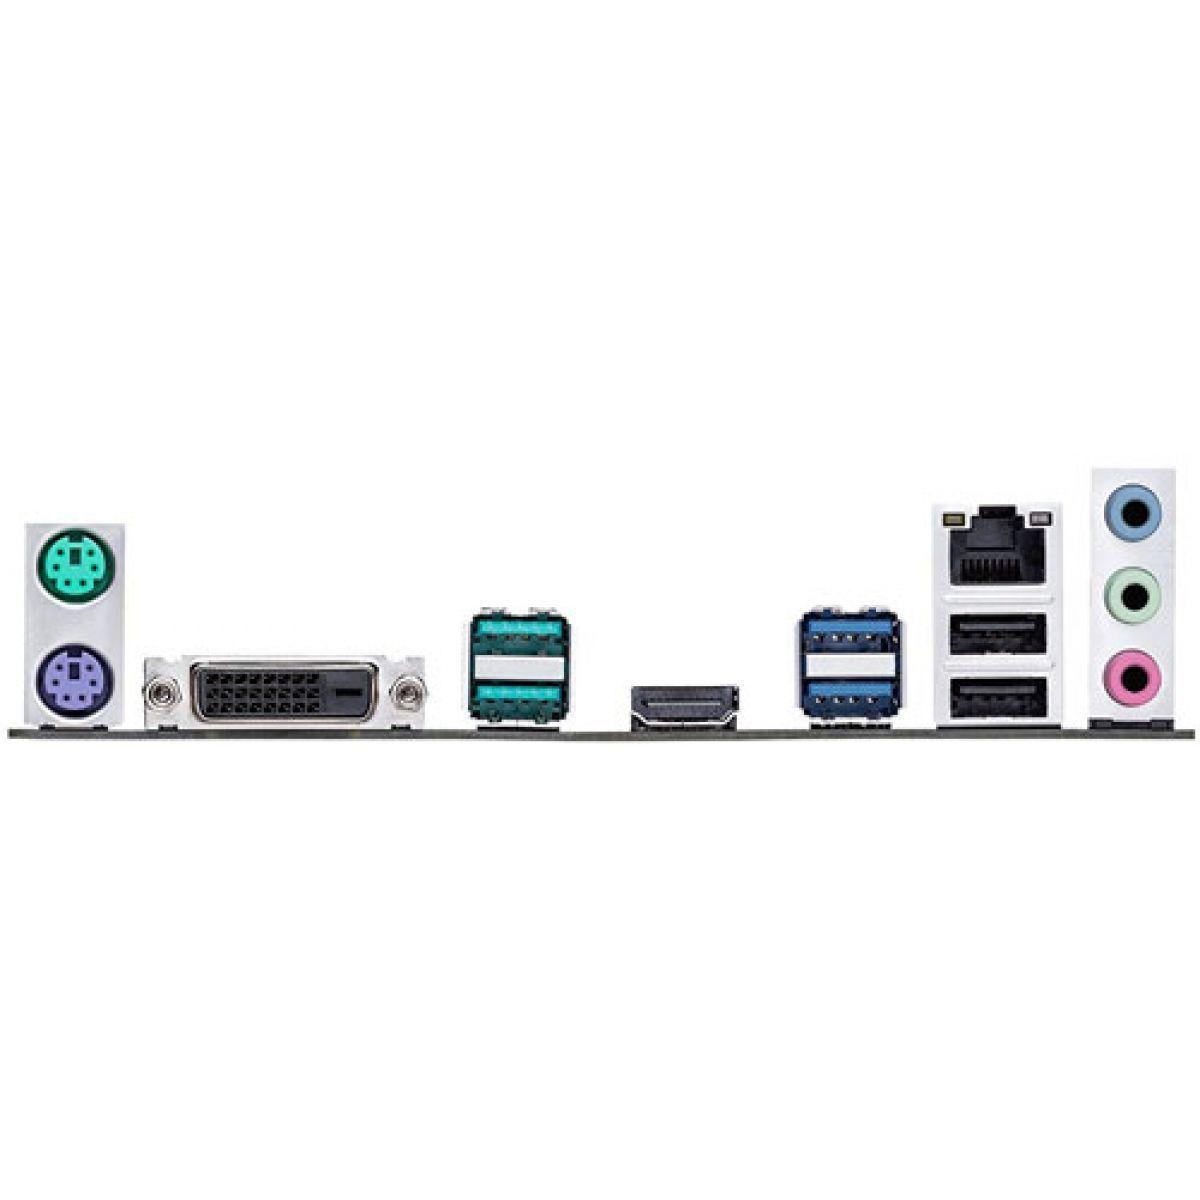 Placa Mae ASUS TUF B360M-E MATX (1151) DDR4 - TUF-B360M-E-GAMING